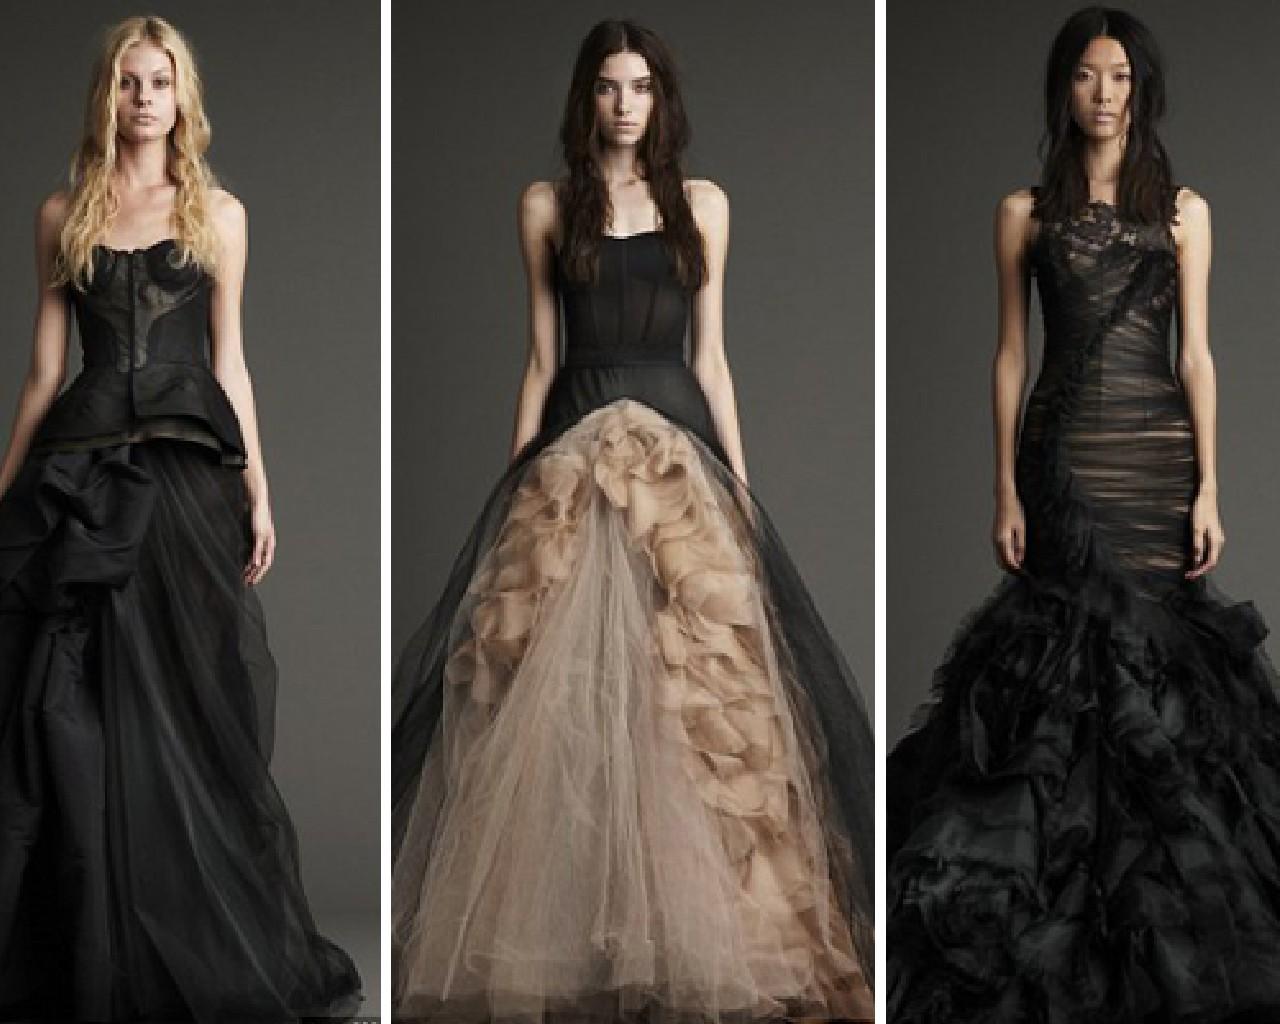 Black Wedding Dress Color : Brideindream colored wedding dresses